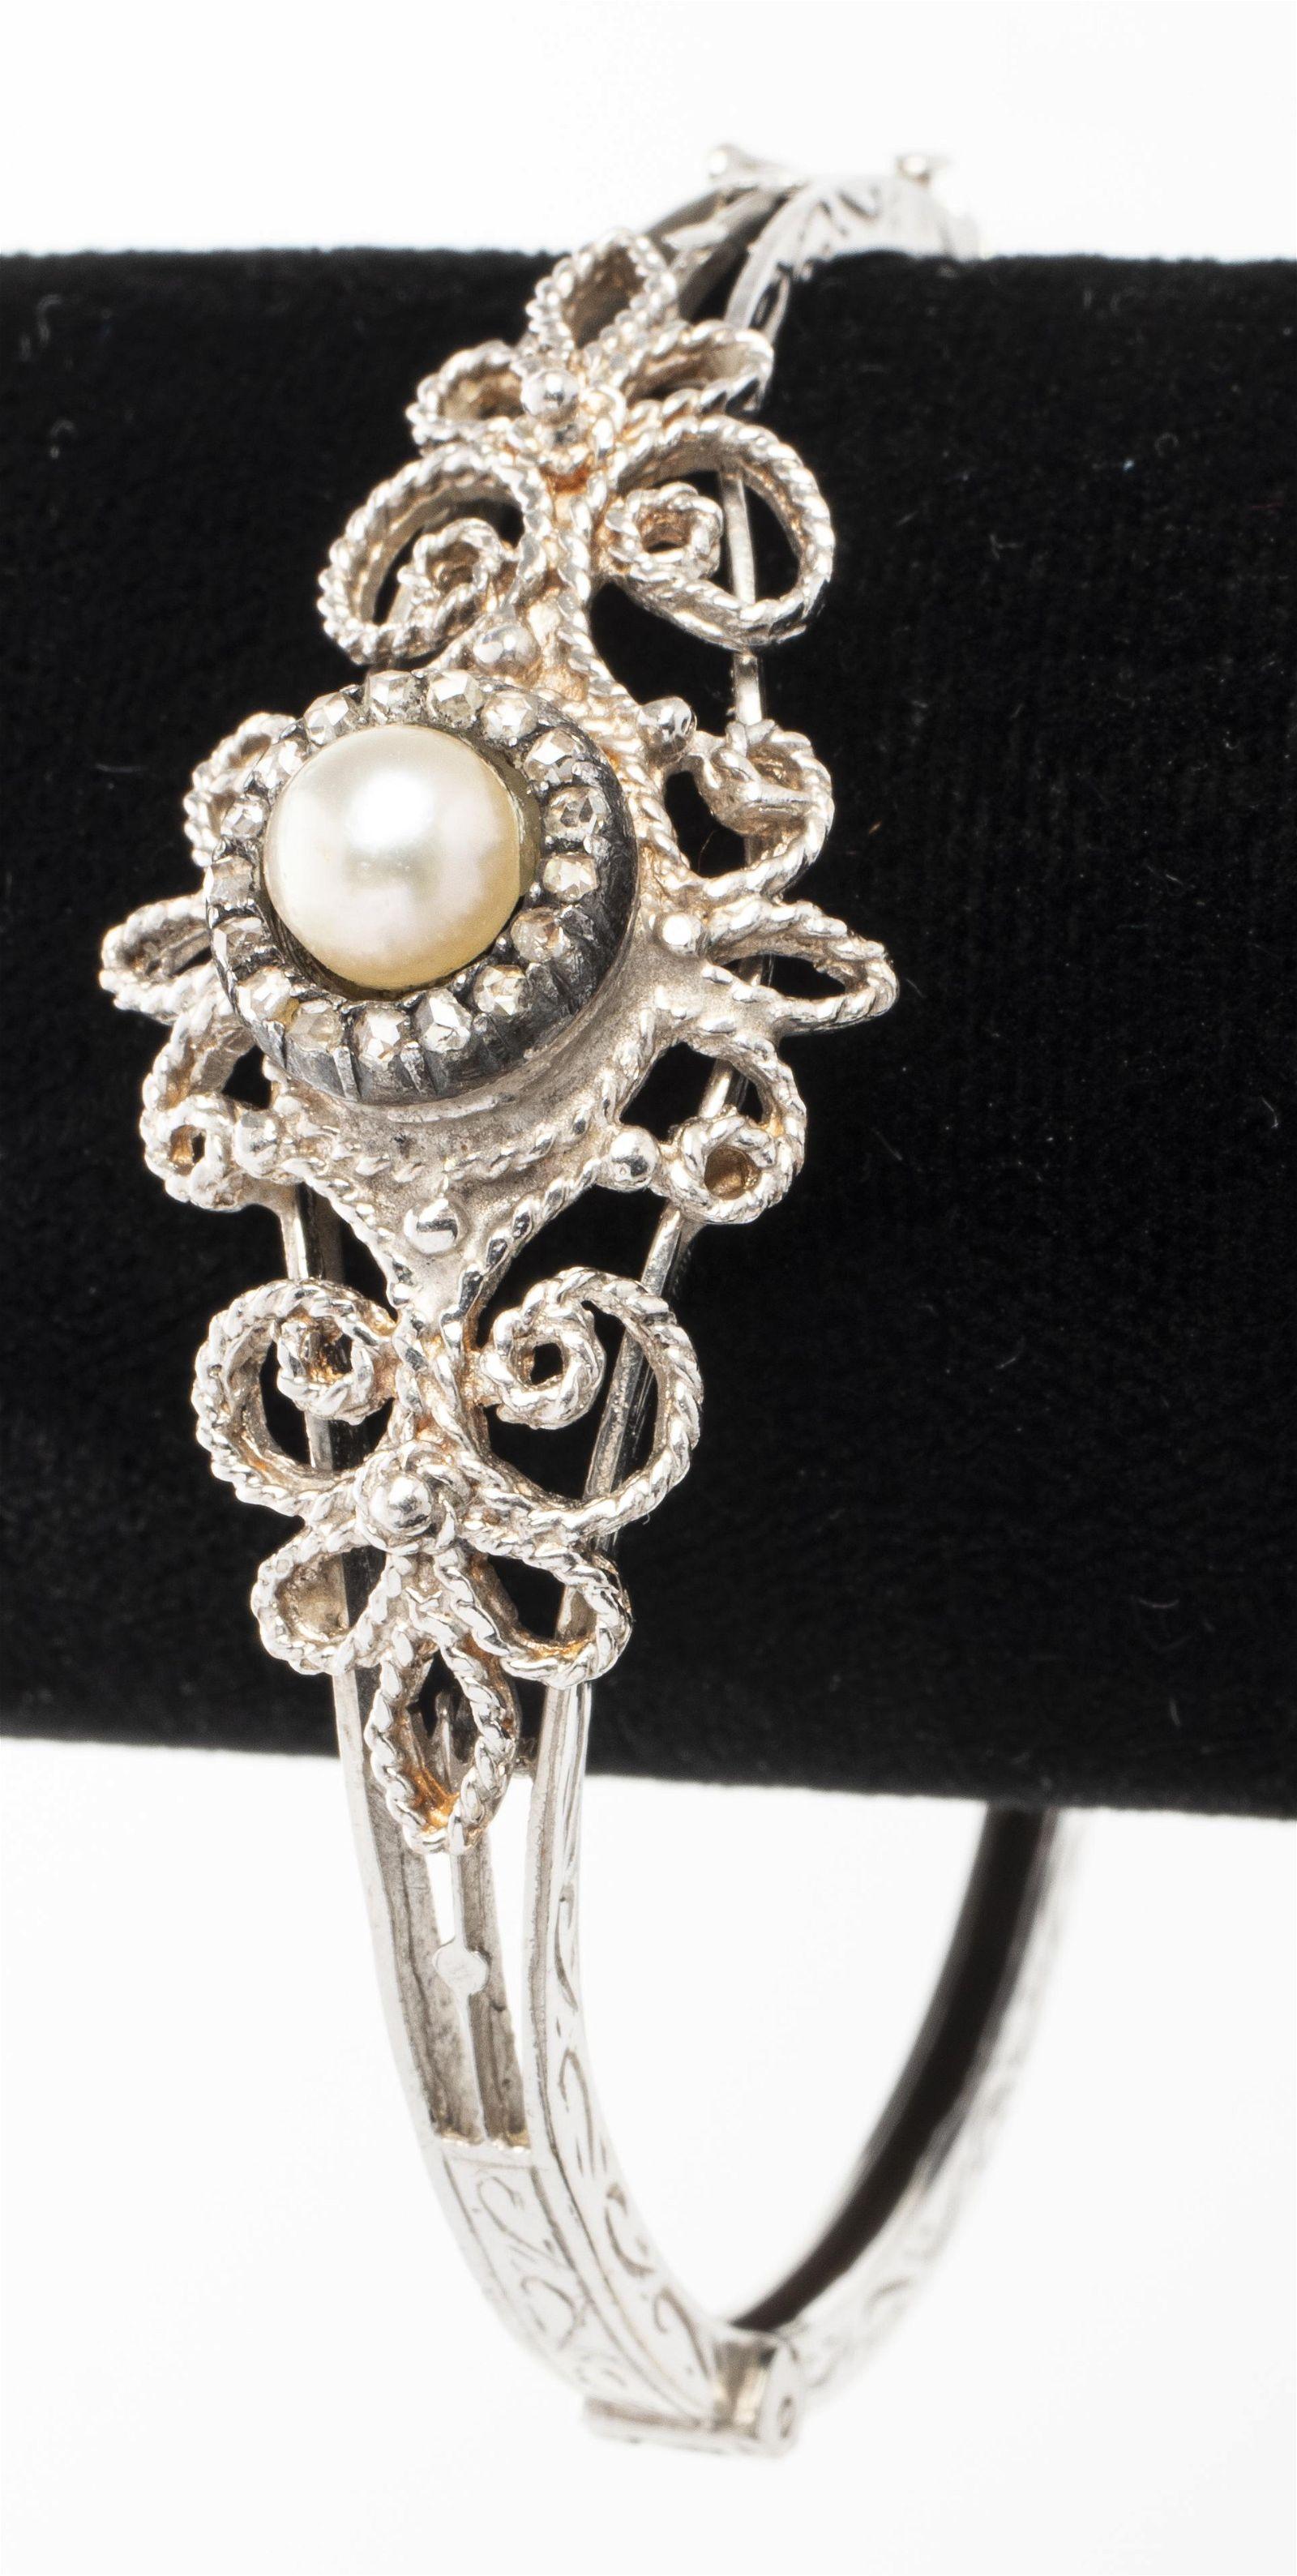 Edwardian 14K Gold Pearl & Diamond Bangle Bracelet